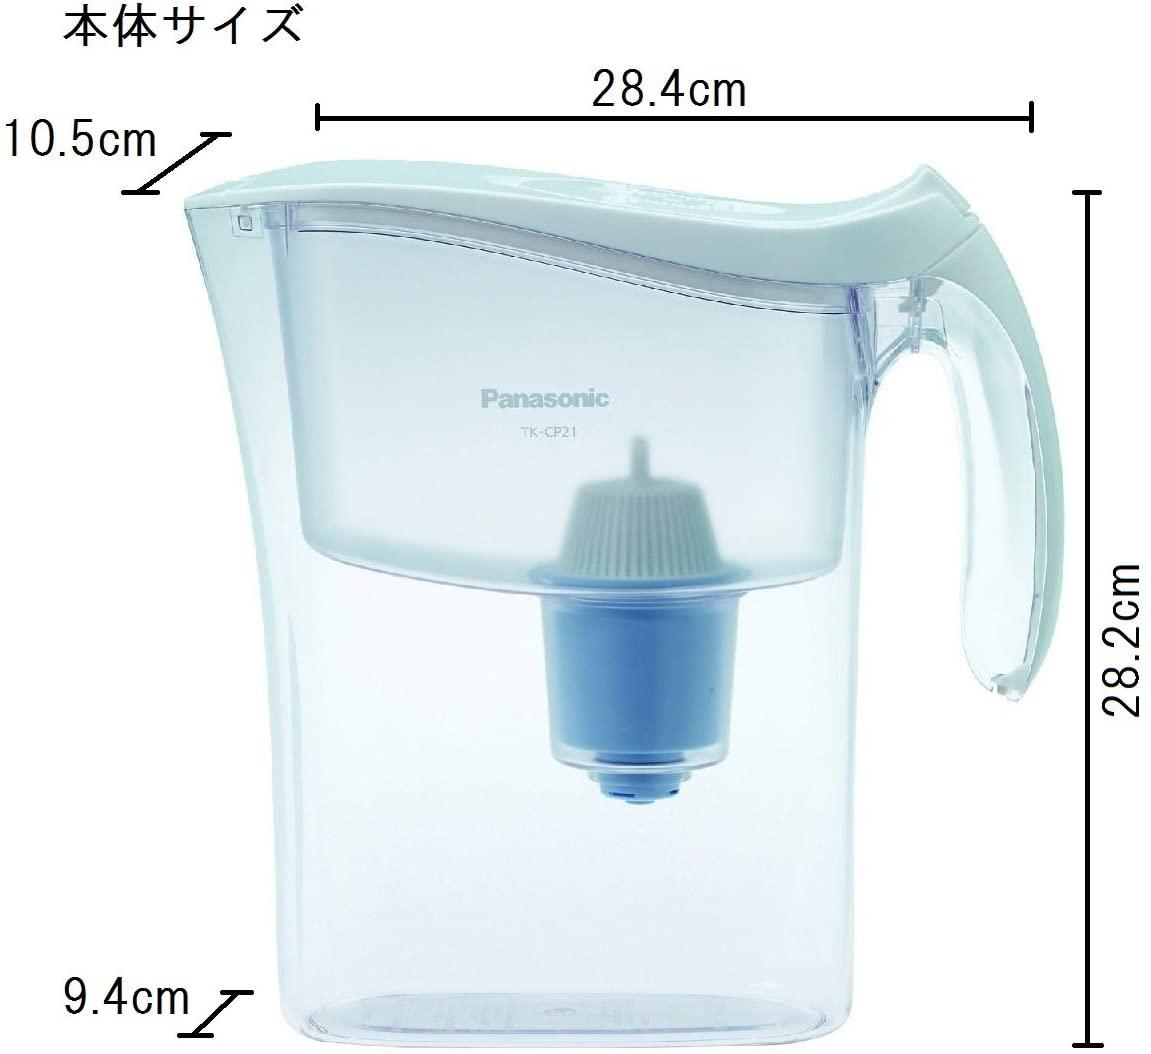 Panasonic(パナソニック)ポット型浄水器 TK-CP21の商品画像2